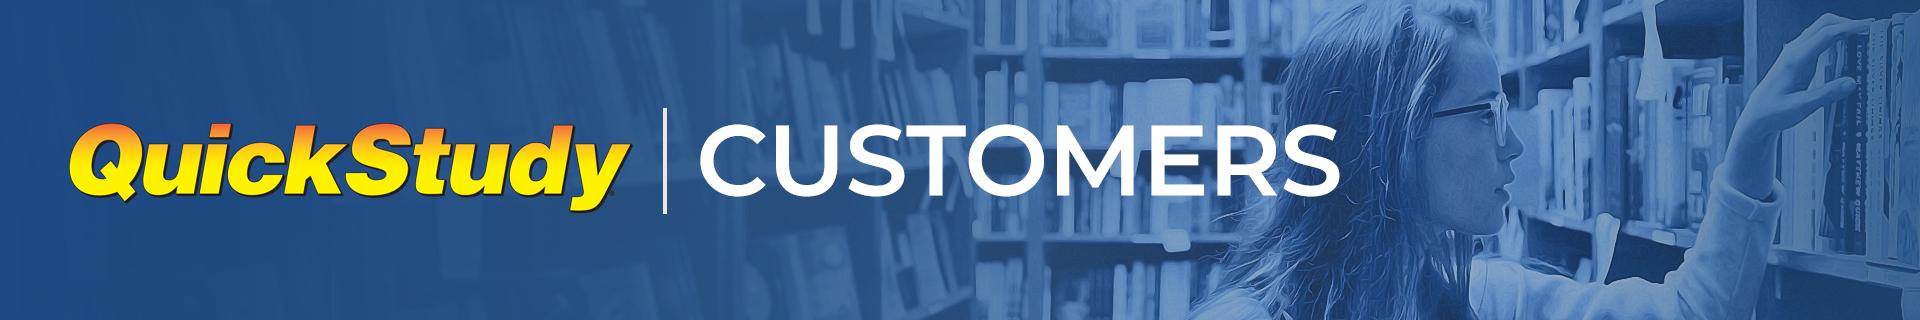 customers-pagebanner.jpg